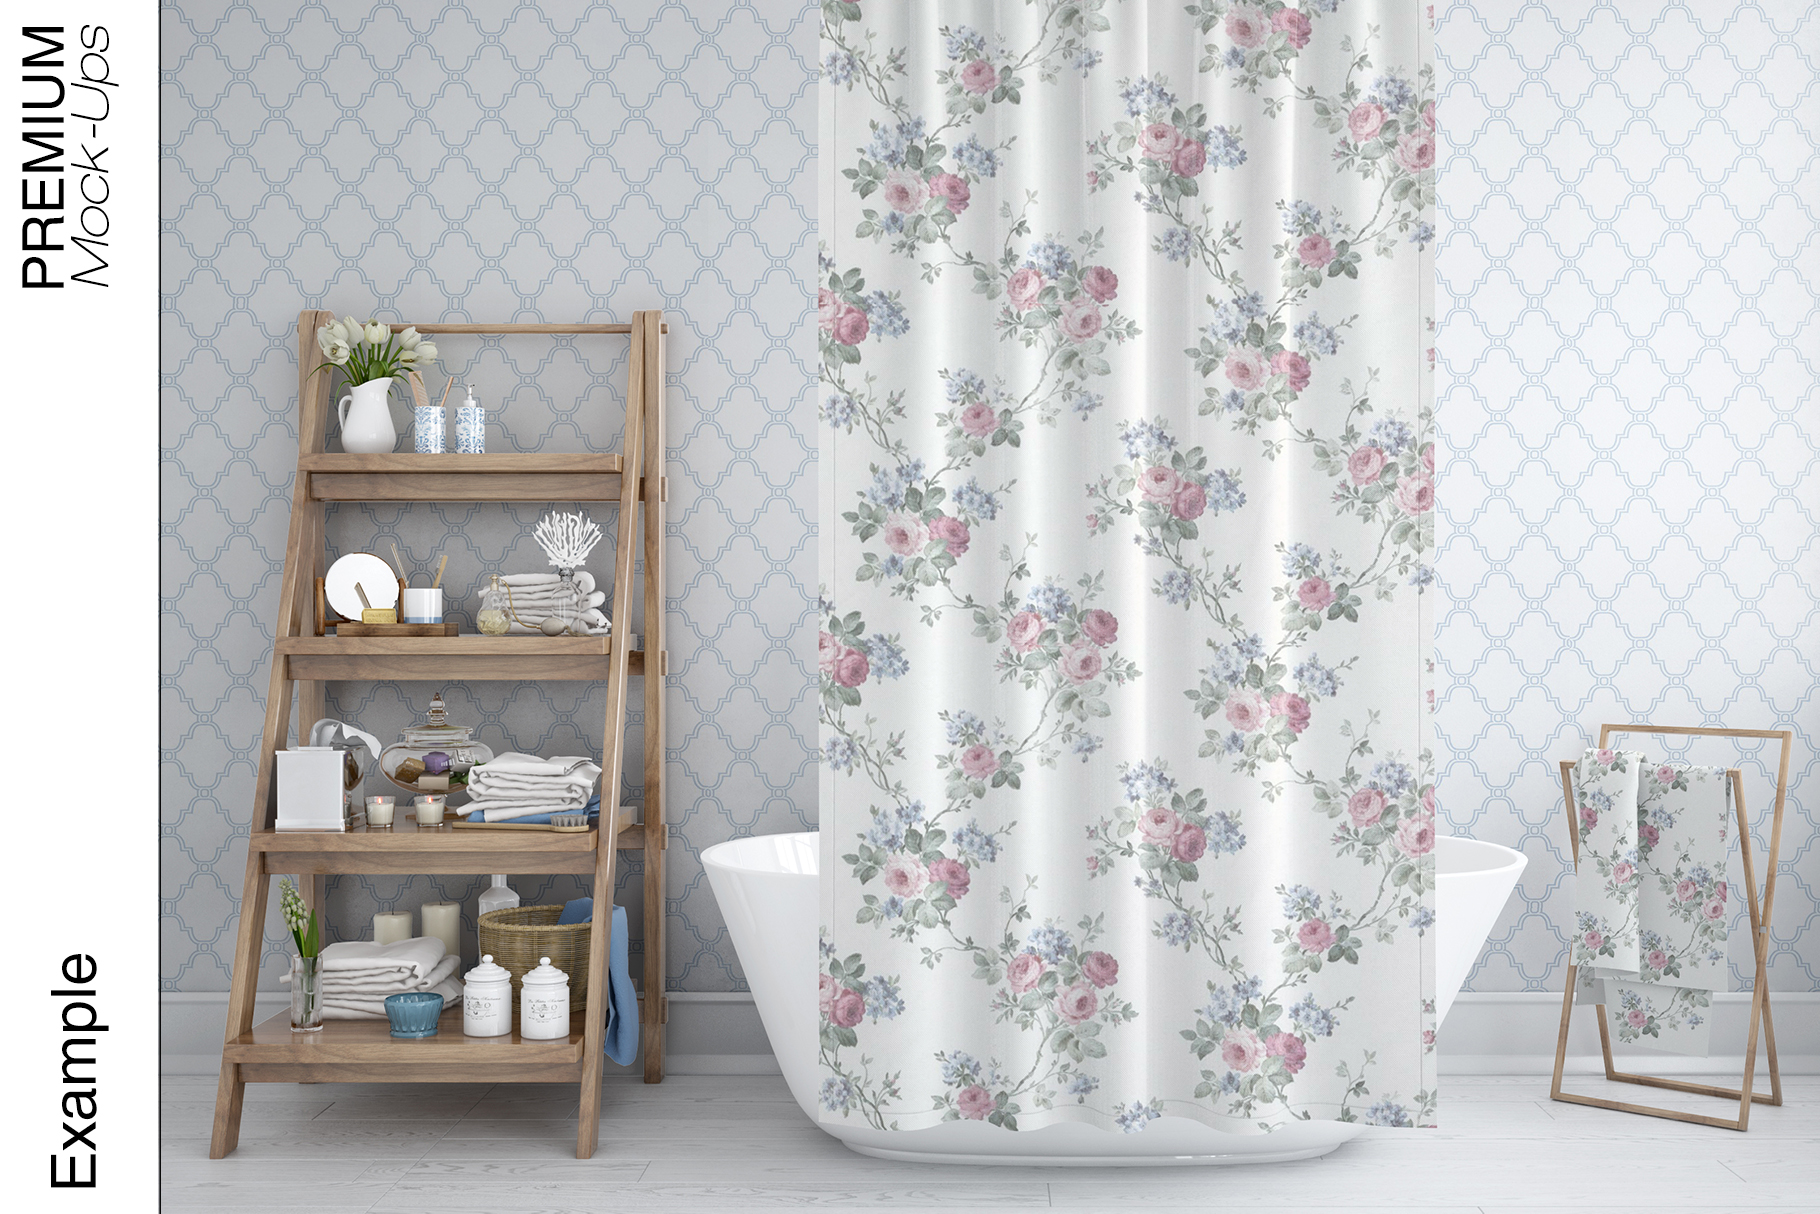 Bath Curtain Mockups example image 11